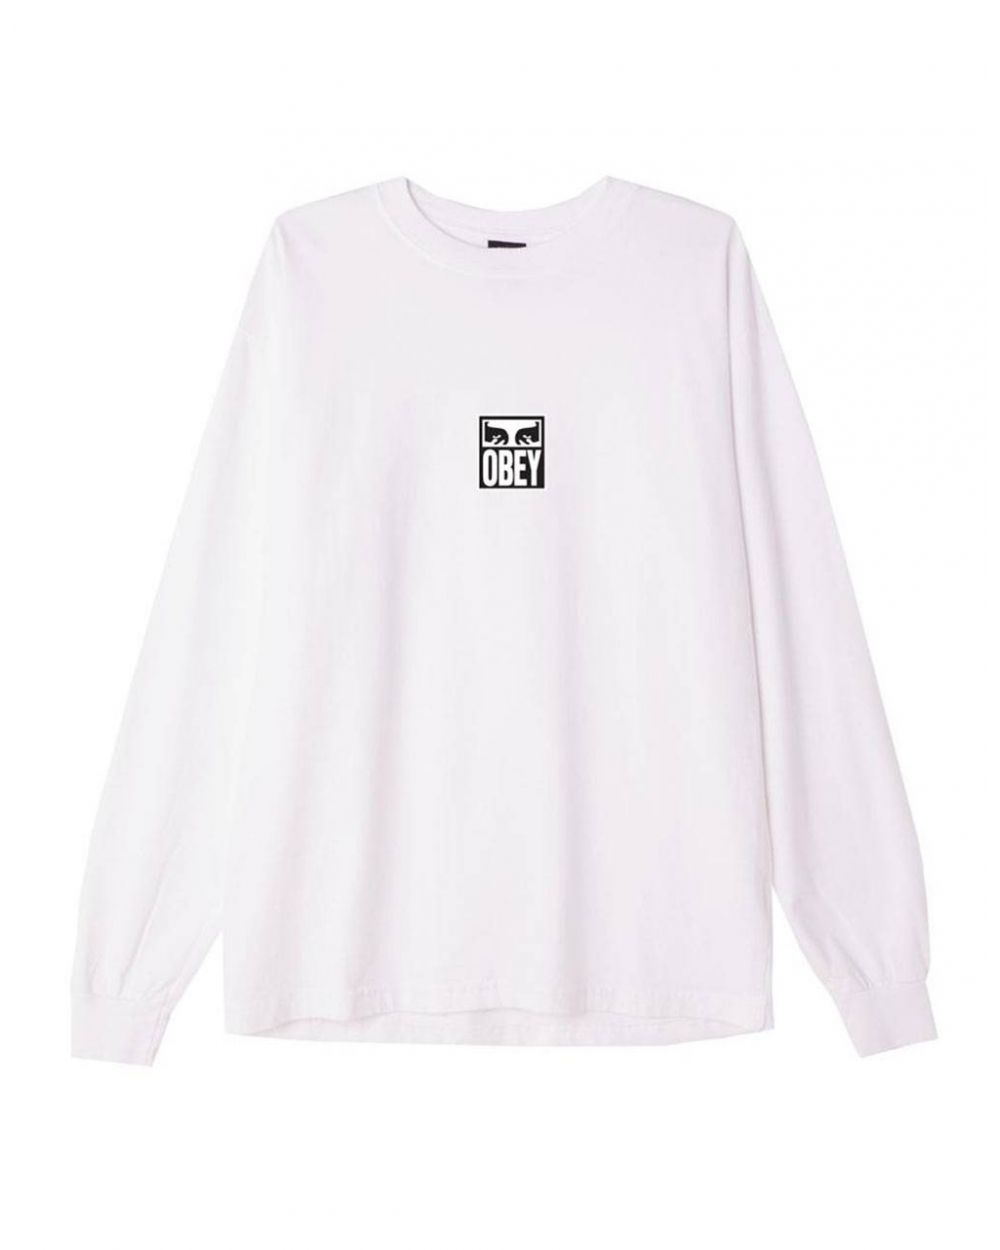 Obey Eyes icon 3 heavyweight longsleeve - white obey T-shirt 49,18€